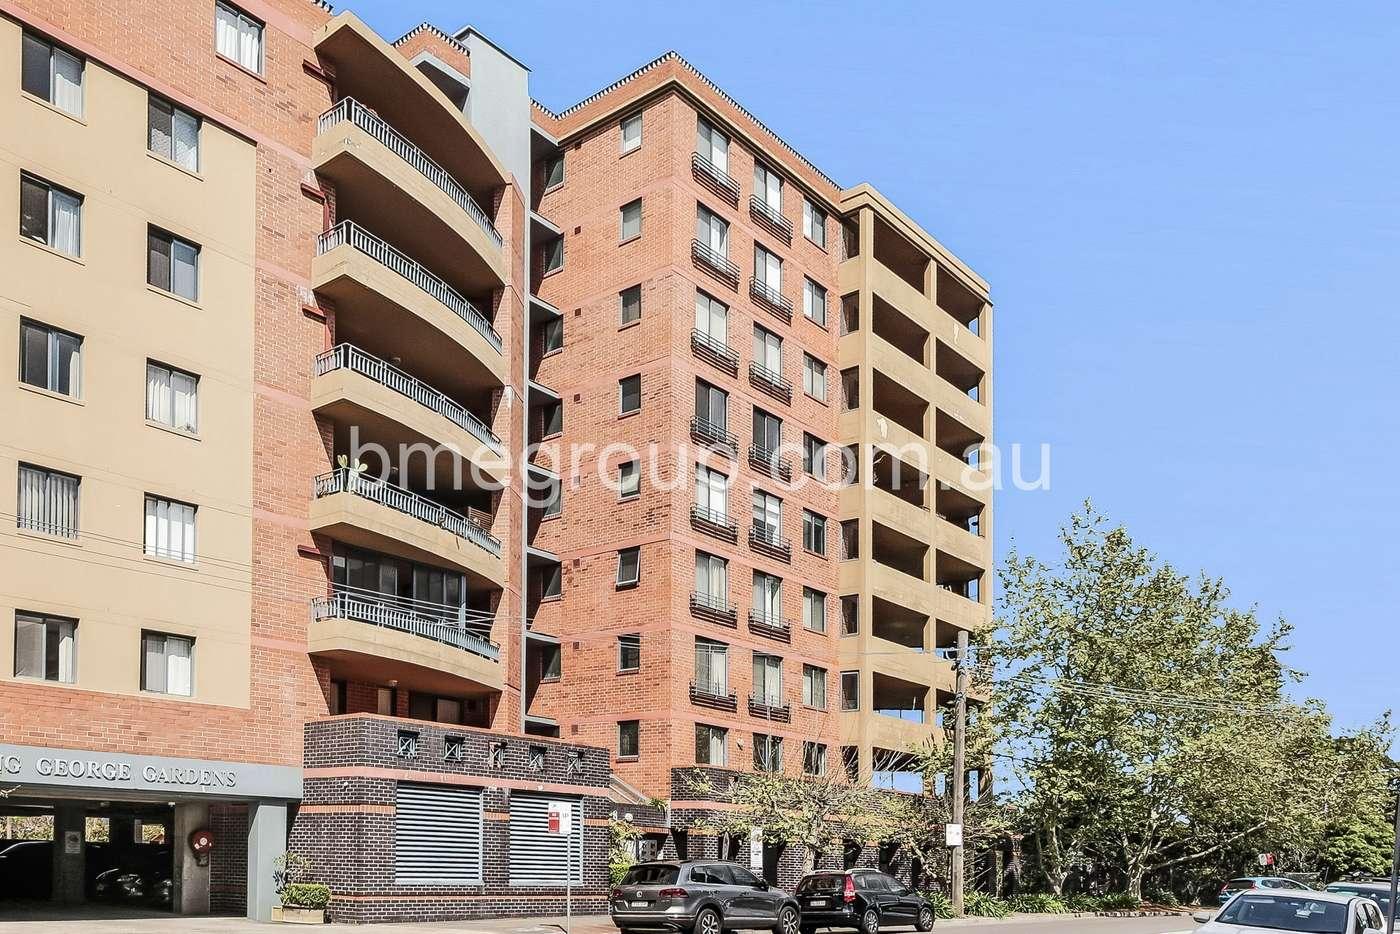 Main view of Homely apartment listing, Unit 41/2-8 Bridge St, Hurstville NSW 2220